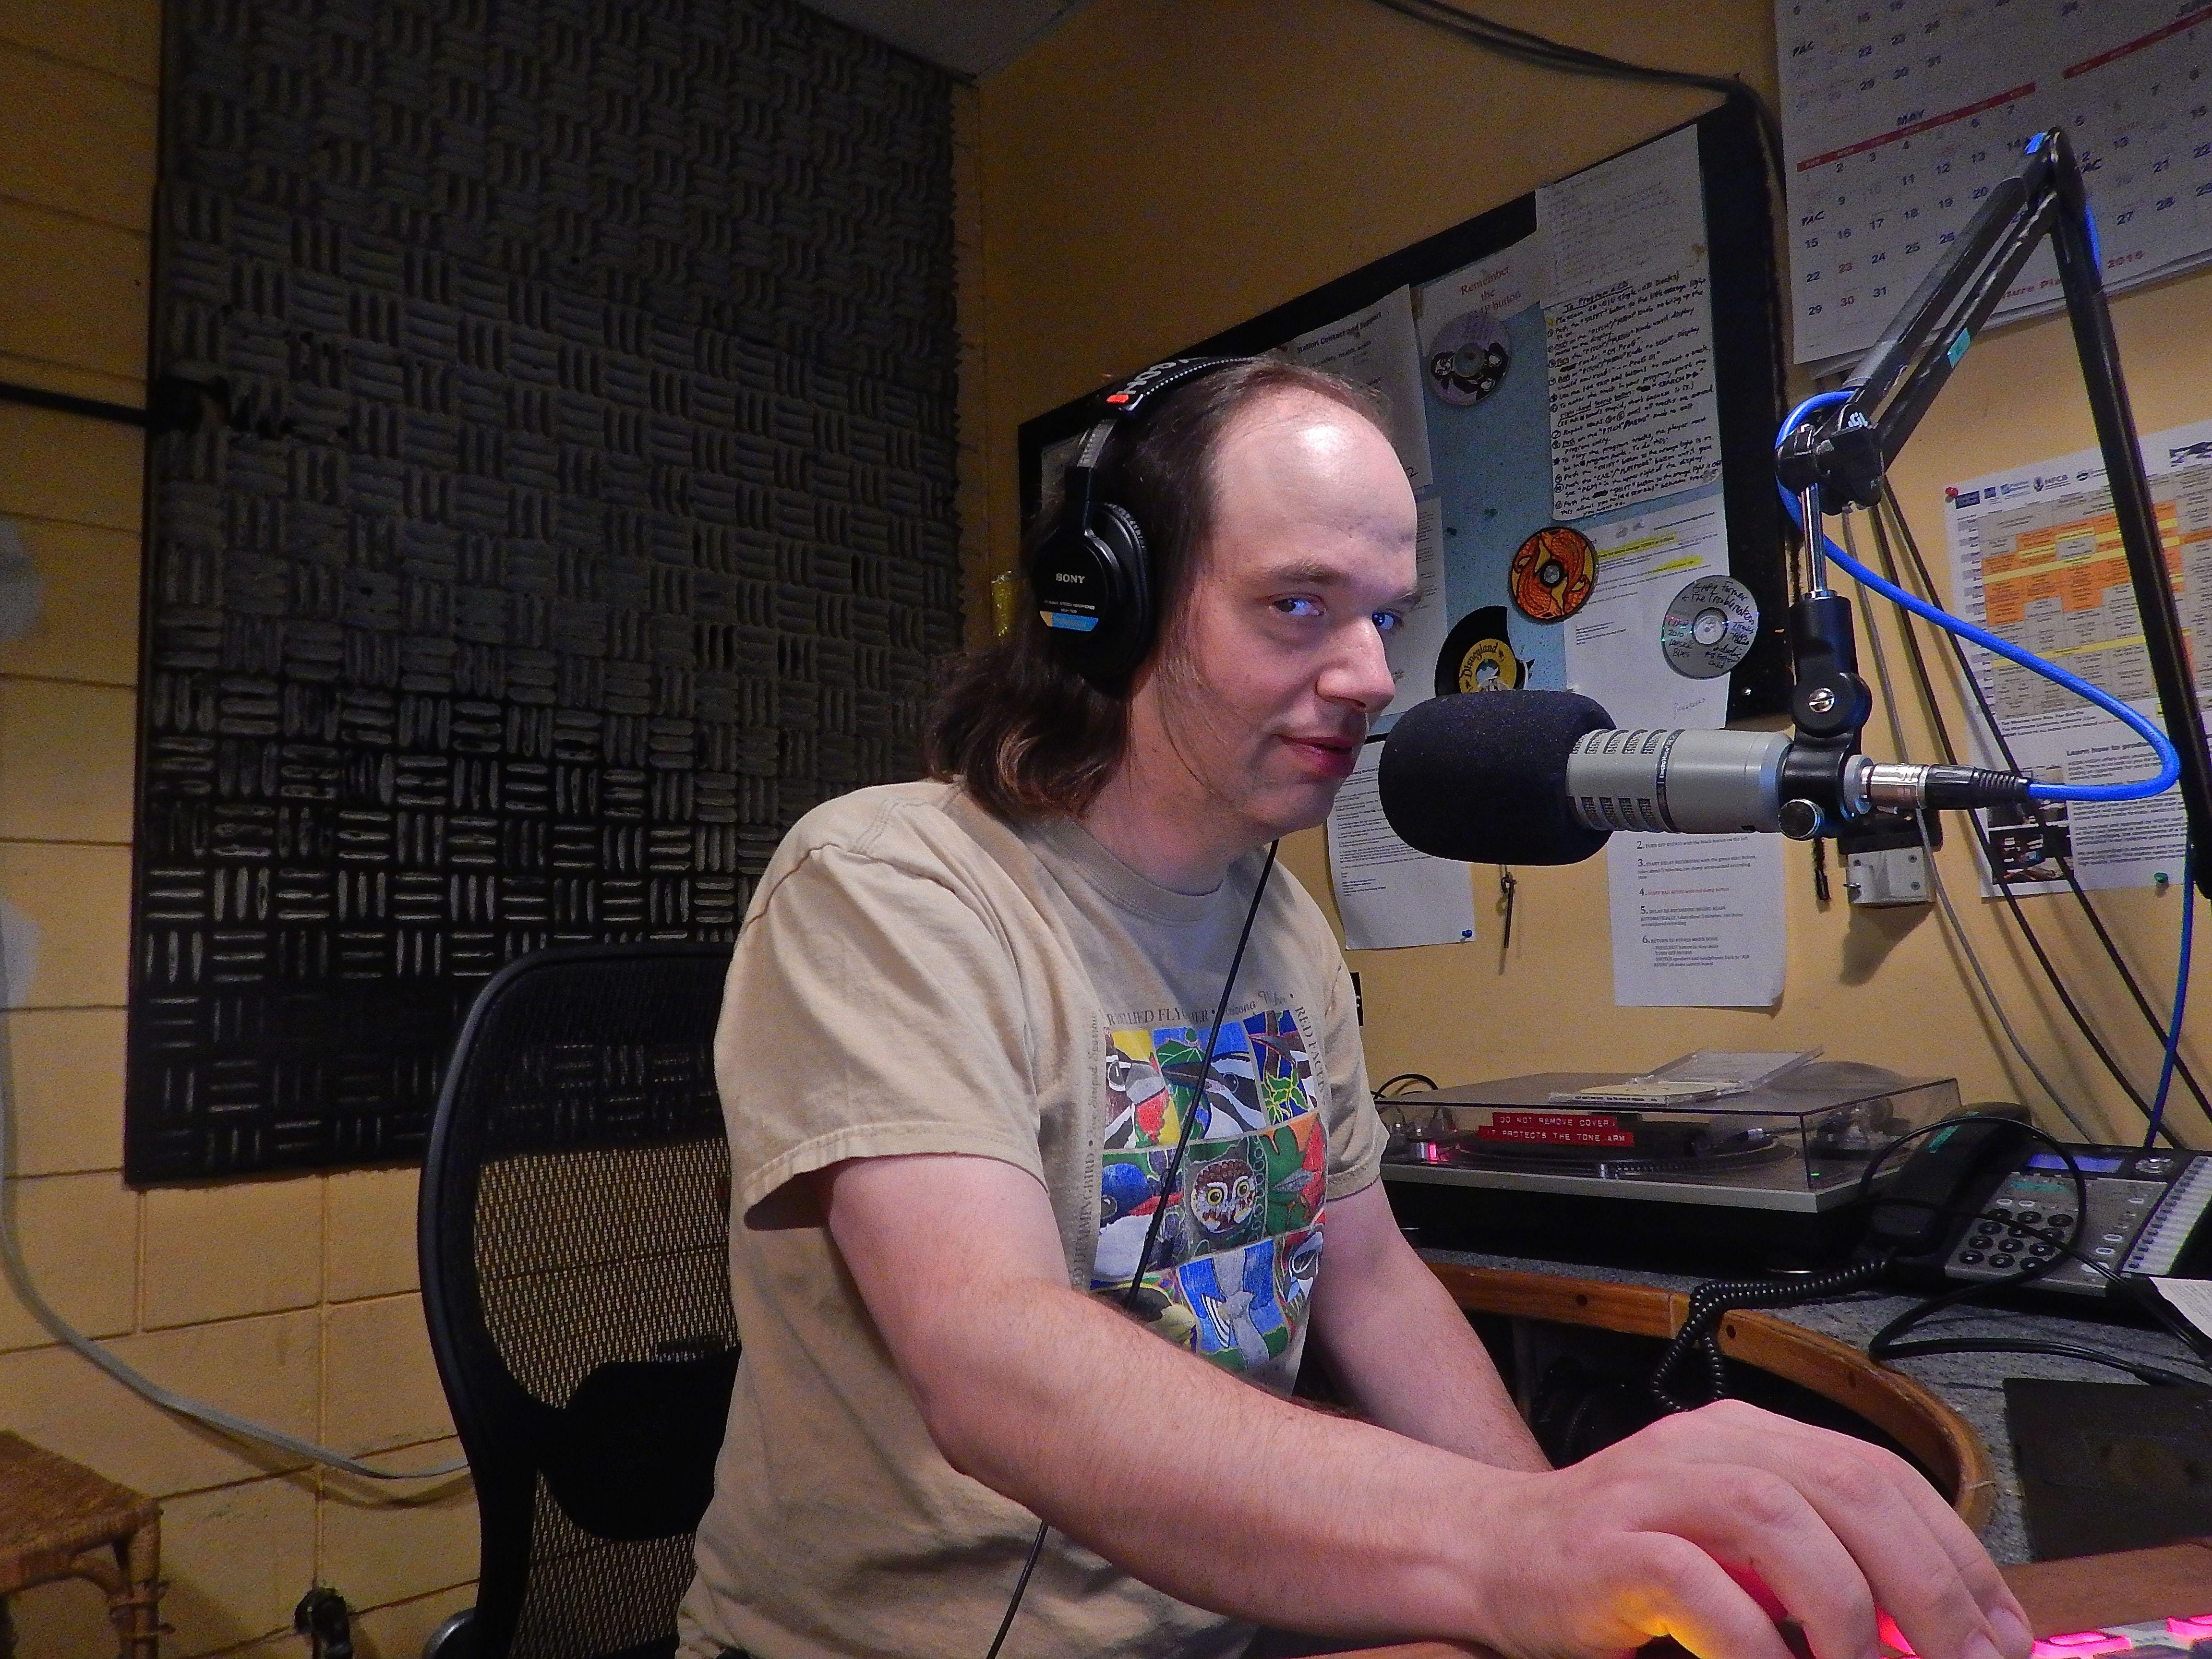 Caption: On the air at WGDR-Plainfield/WGDH-Hardwick, doing The Origin Series, Credit: Brian Aust